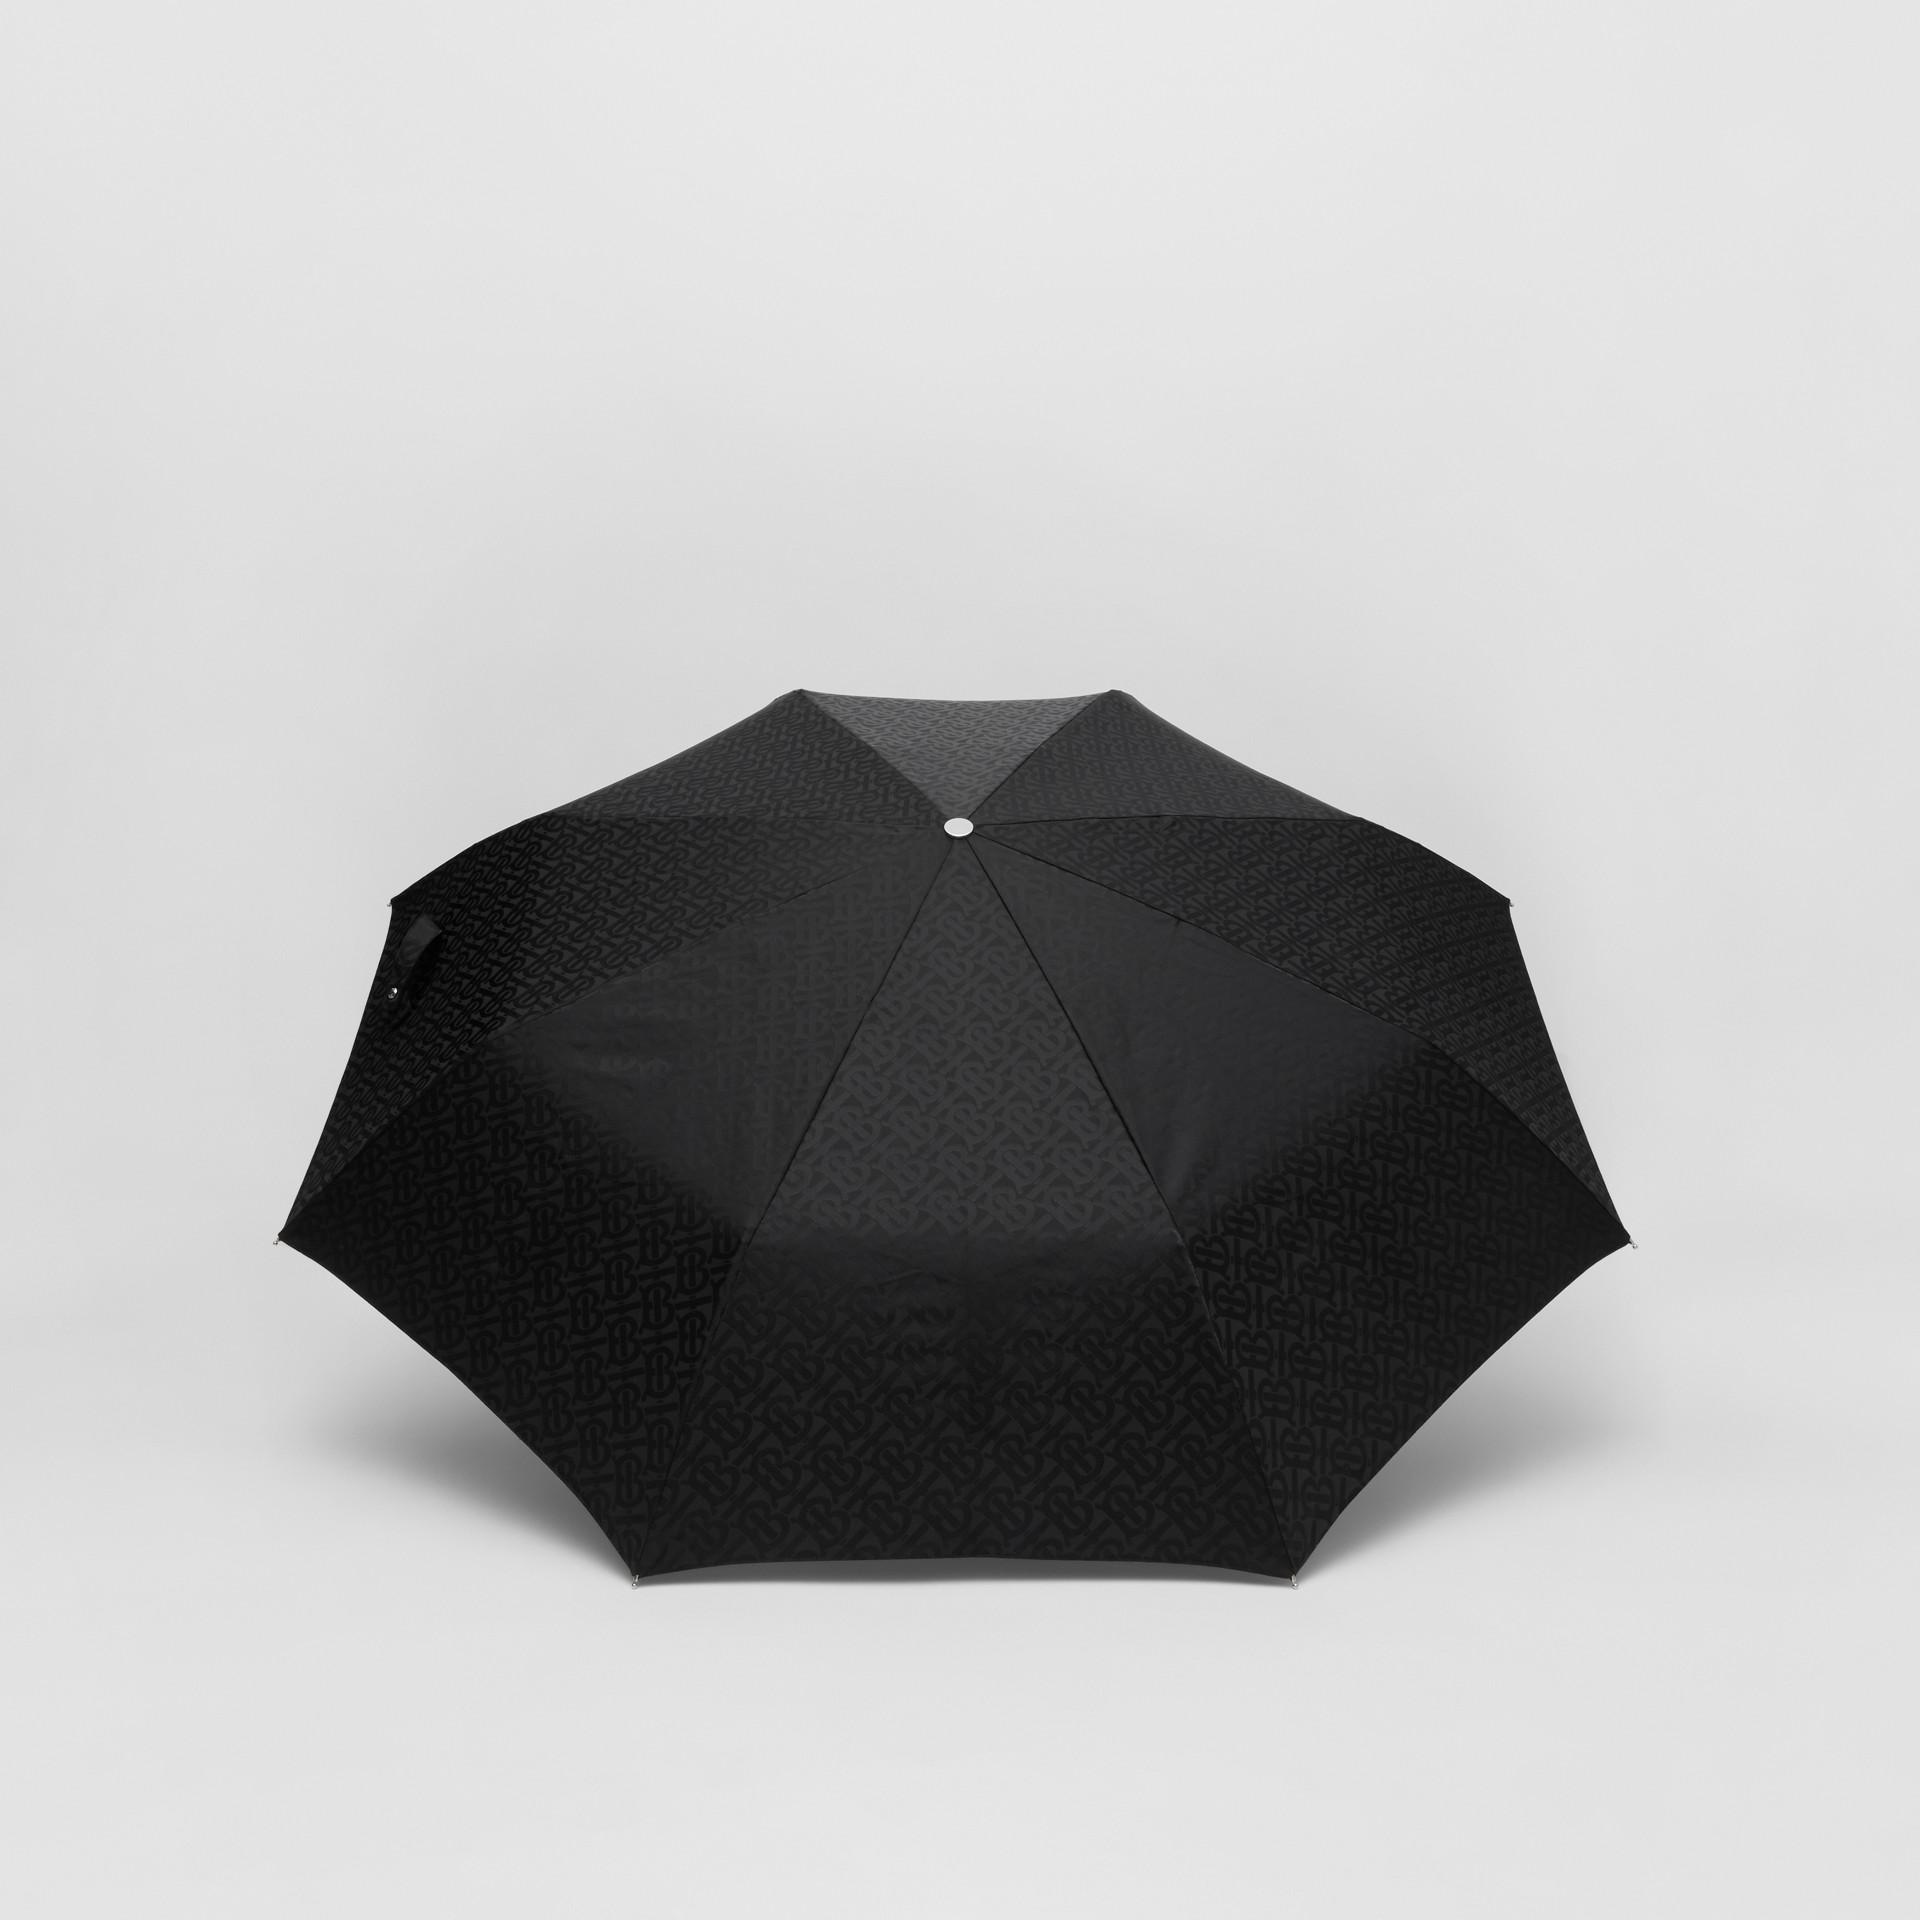 Monogram Print Folding Umbrella in Black | Burberry - gallery image 4